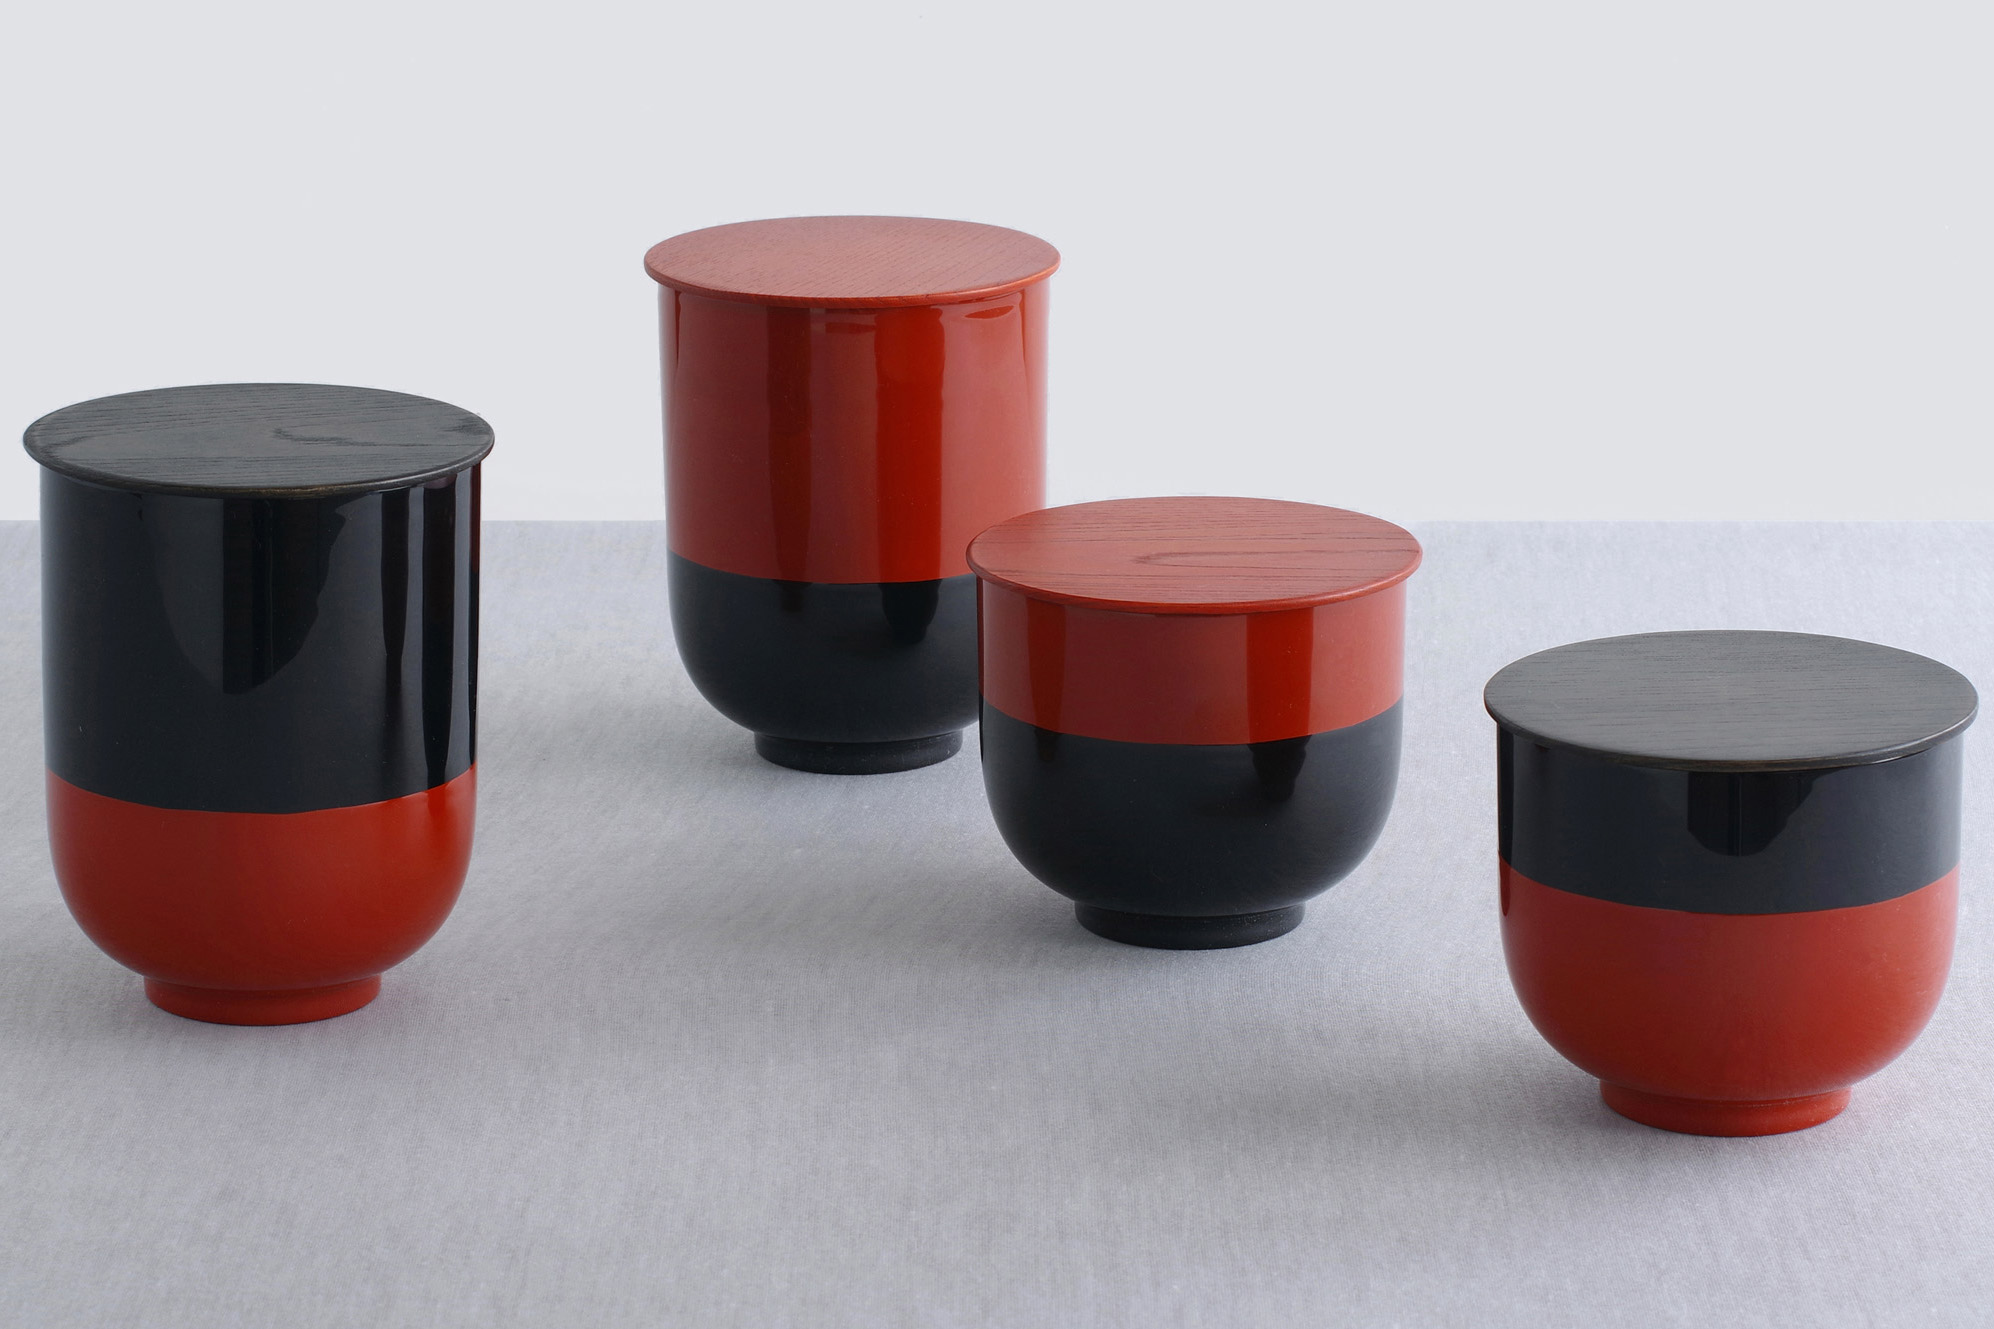 store-sekisaka-japan-creative-design-milan-homeware-_dezeen_hero-b.jpg